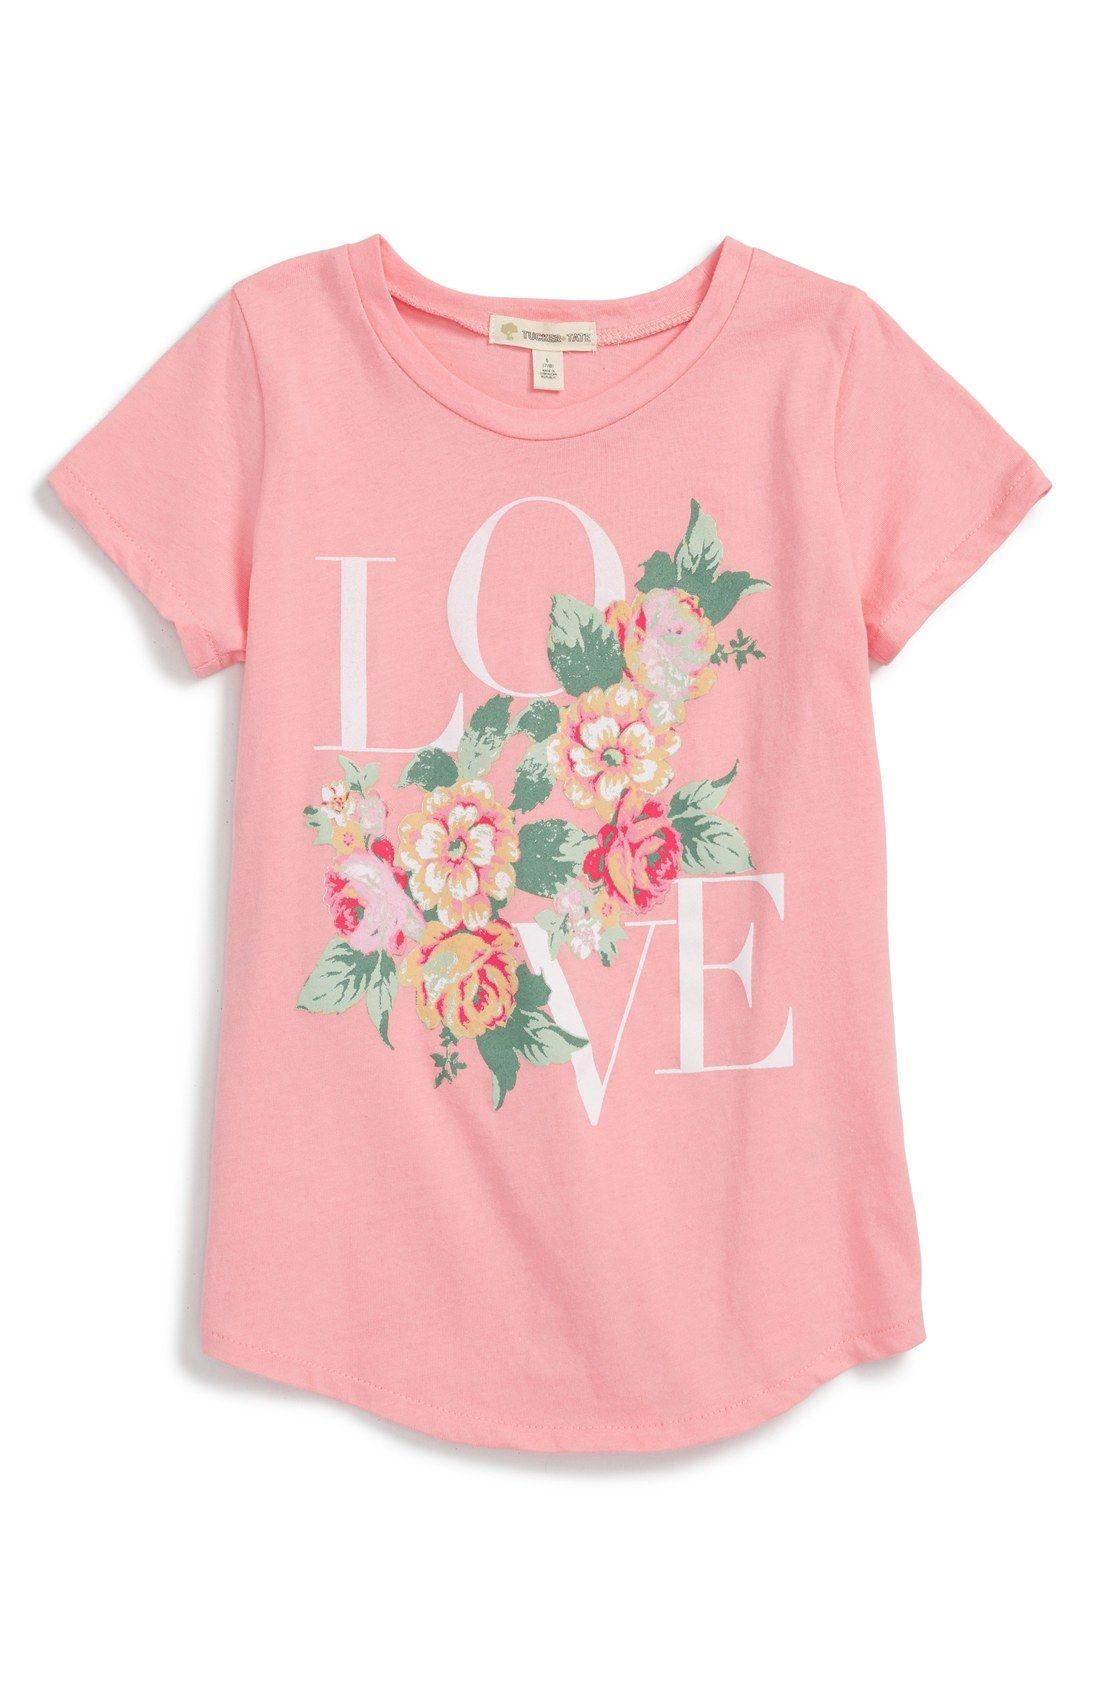 960dc81d8038 Tucker + Tate  Love  Graphic Tee (Big Girls)